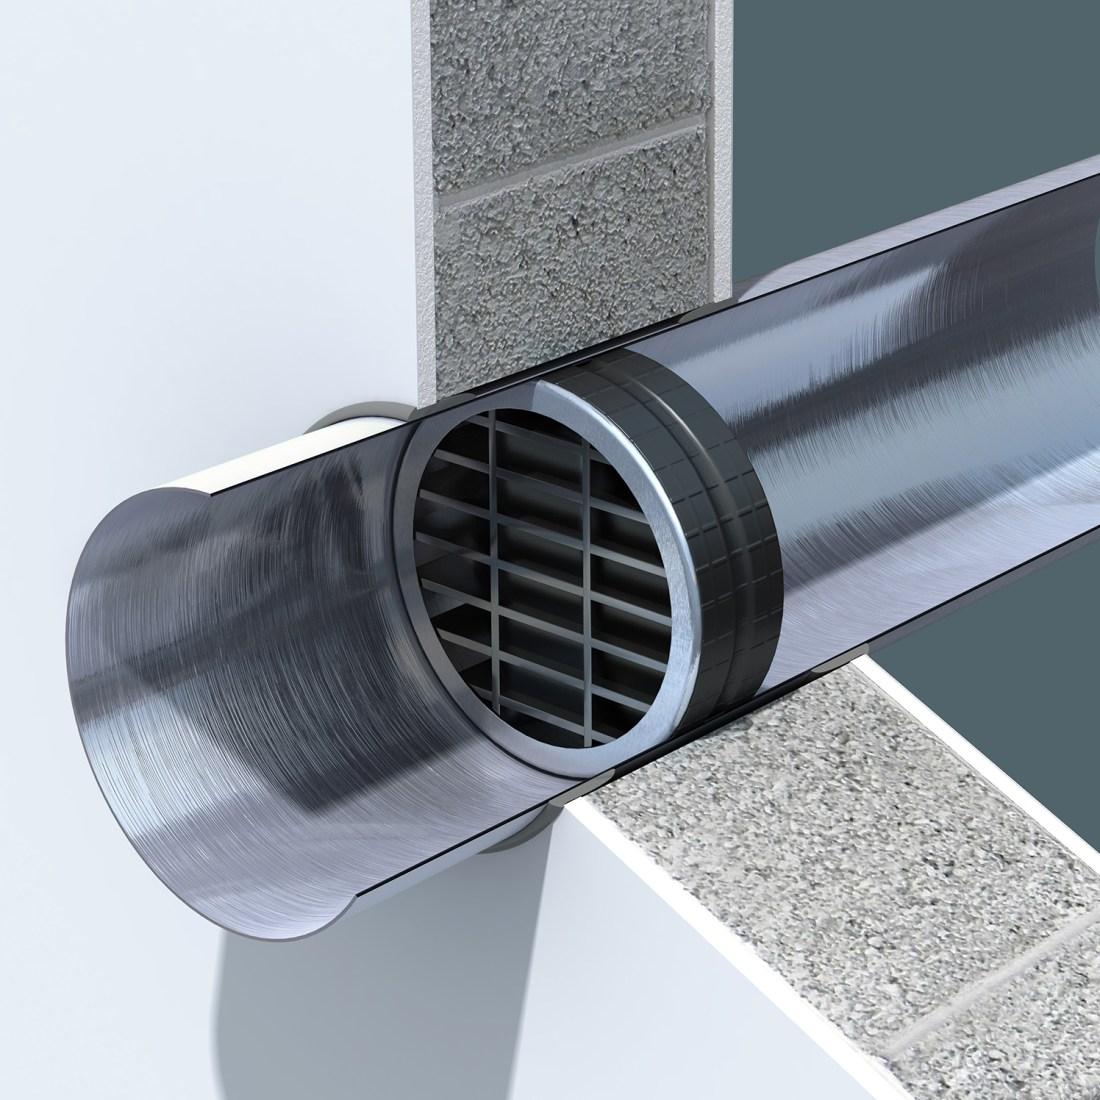 circular ventilation grille, circular intumescent grille, fire and smoke grille, fire proof circular ventilation grille,